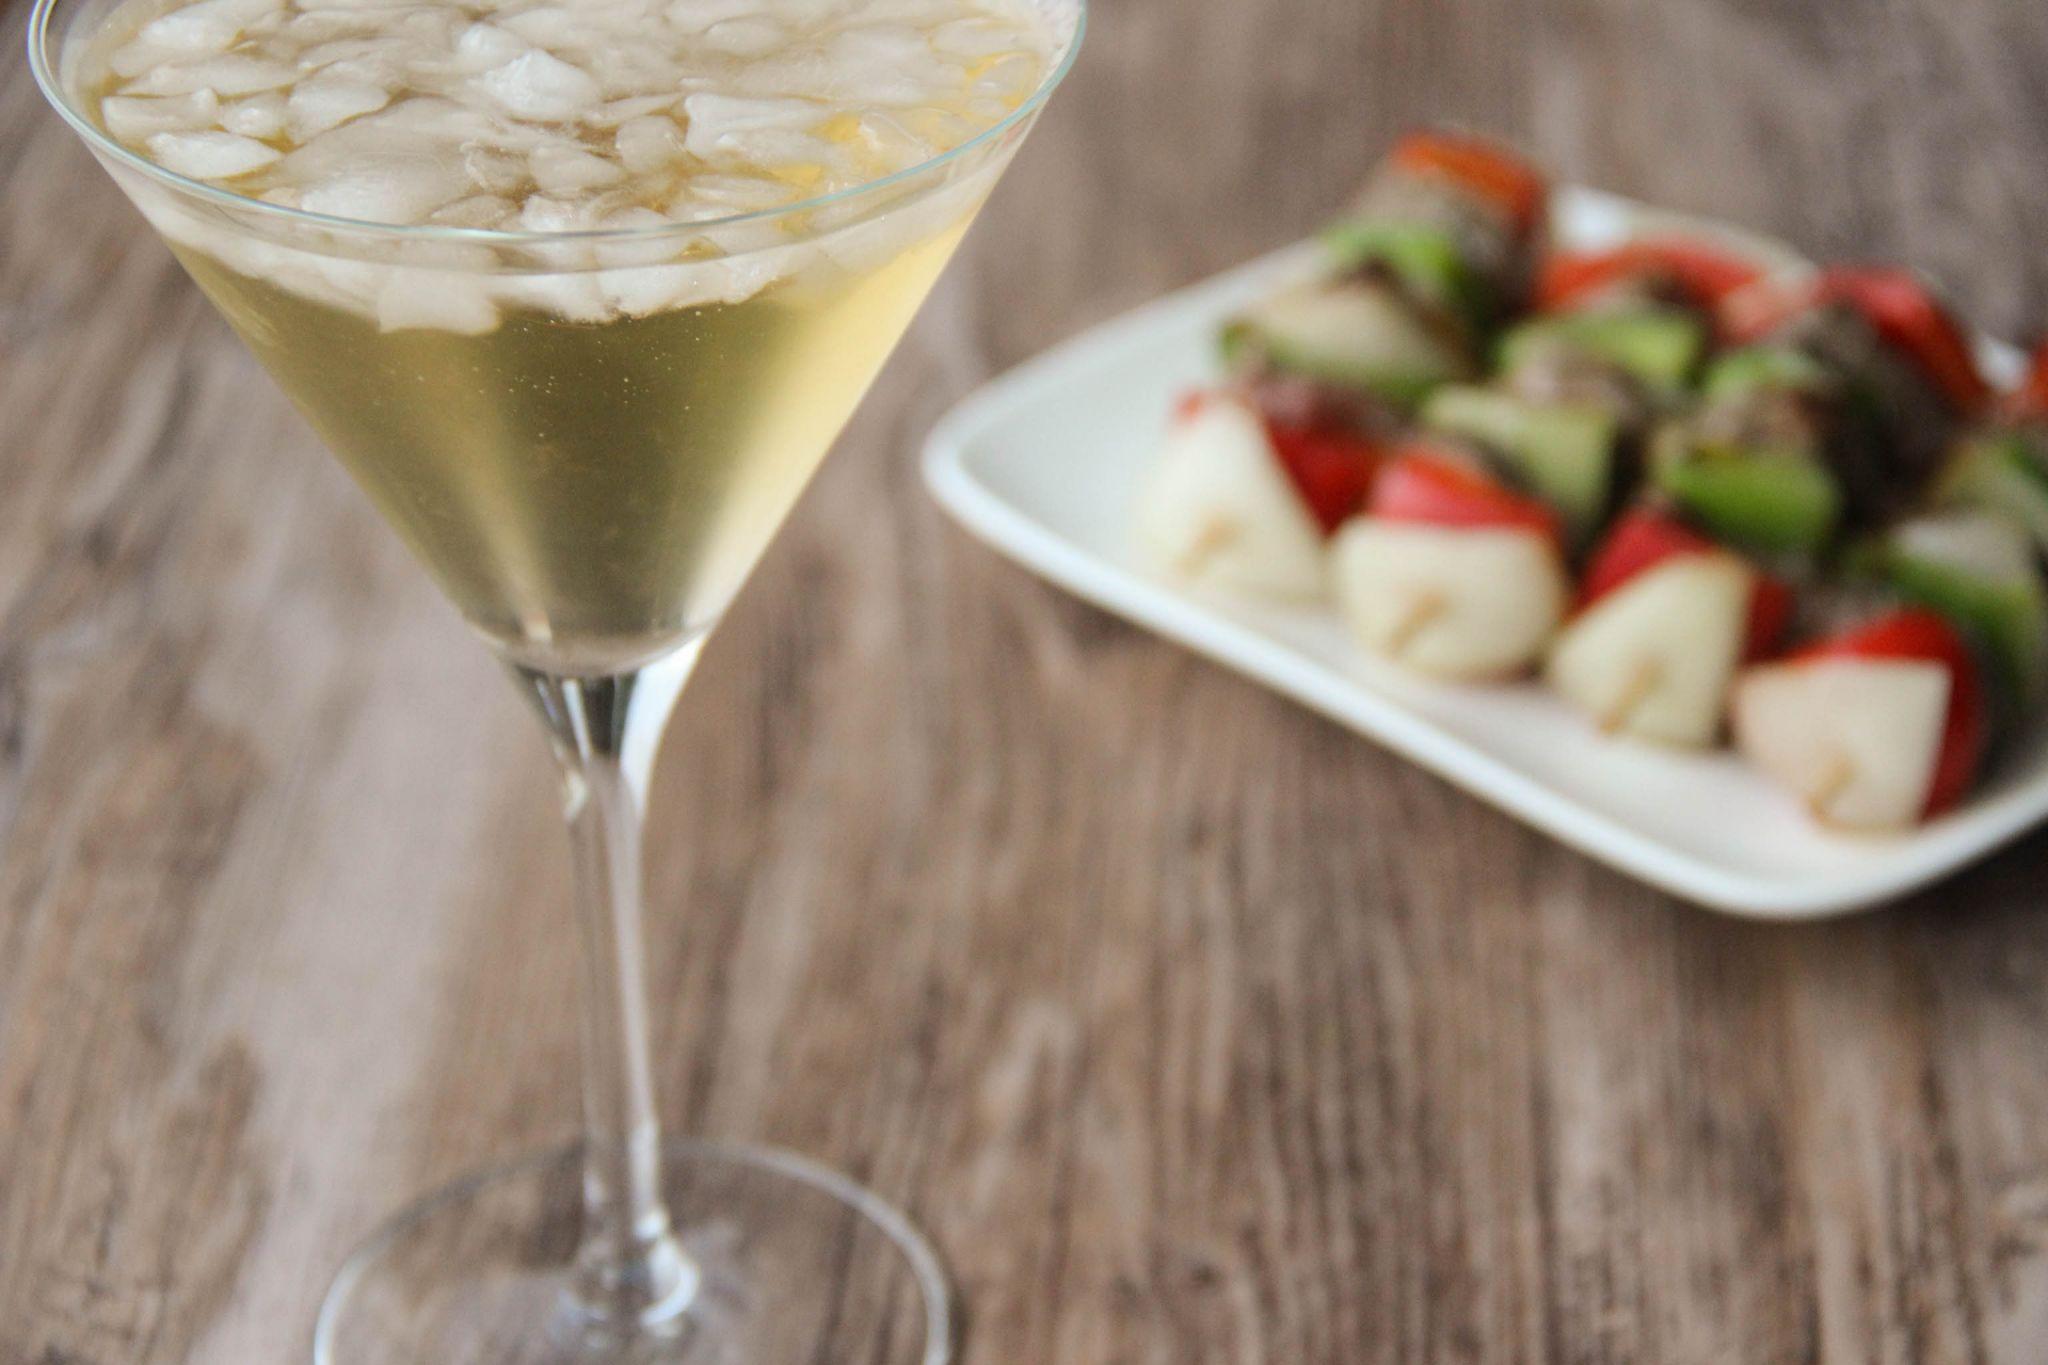 Apple martini cocktail and rumsteack kebab